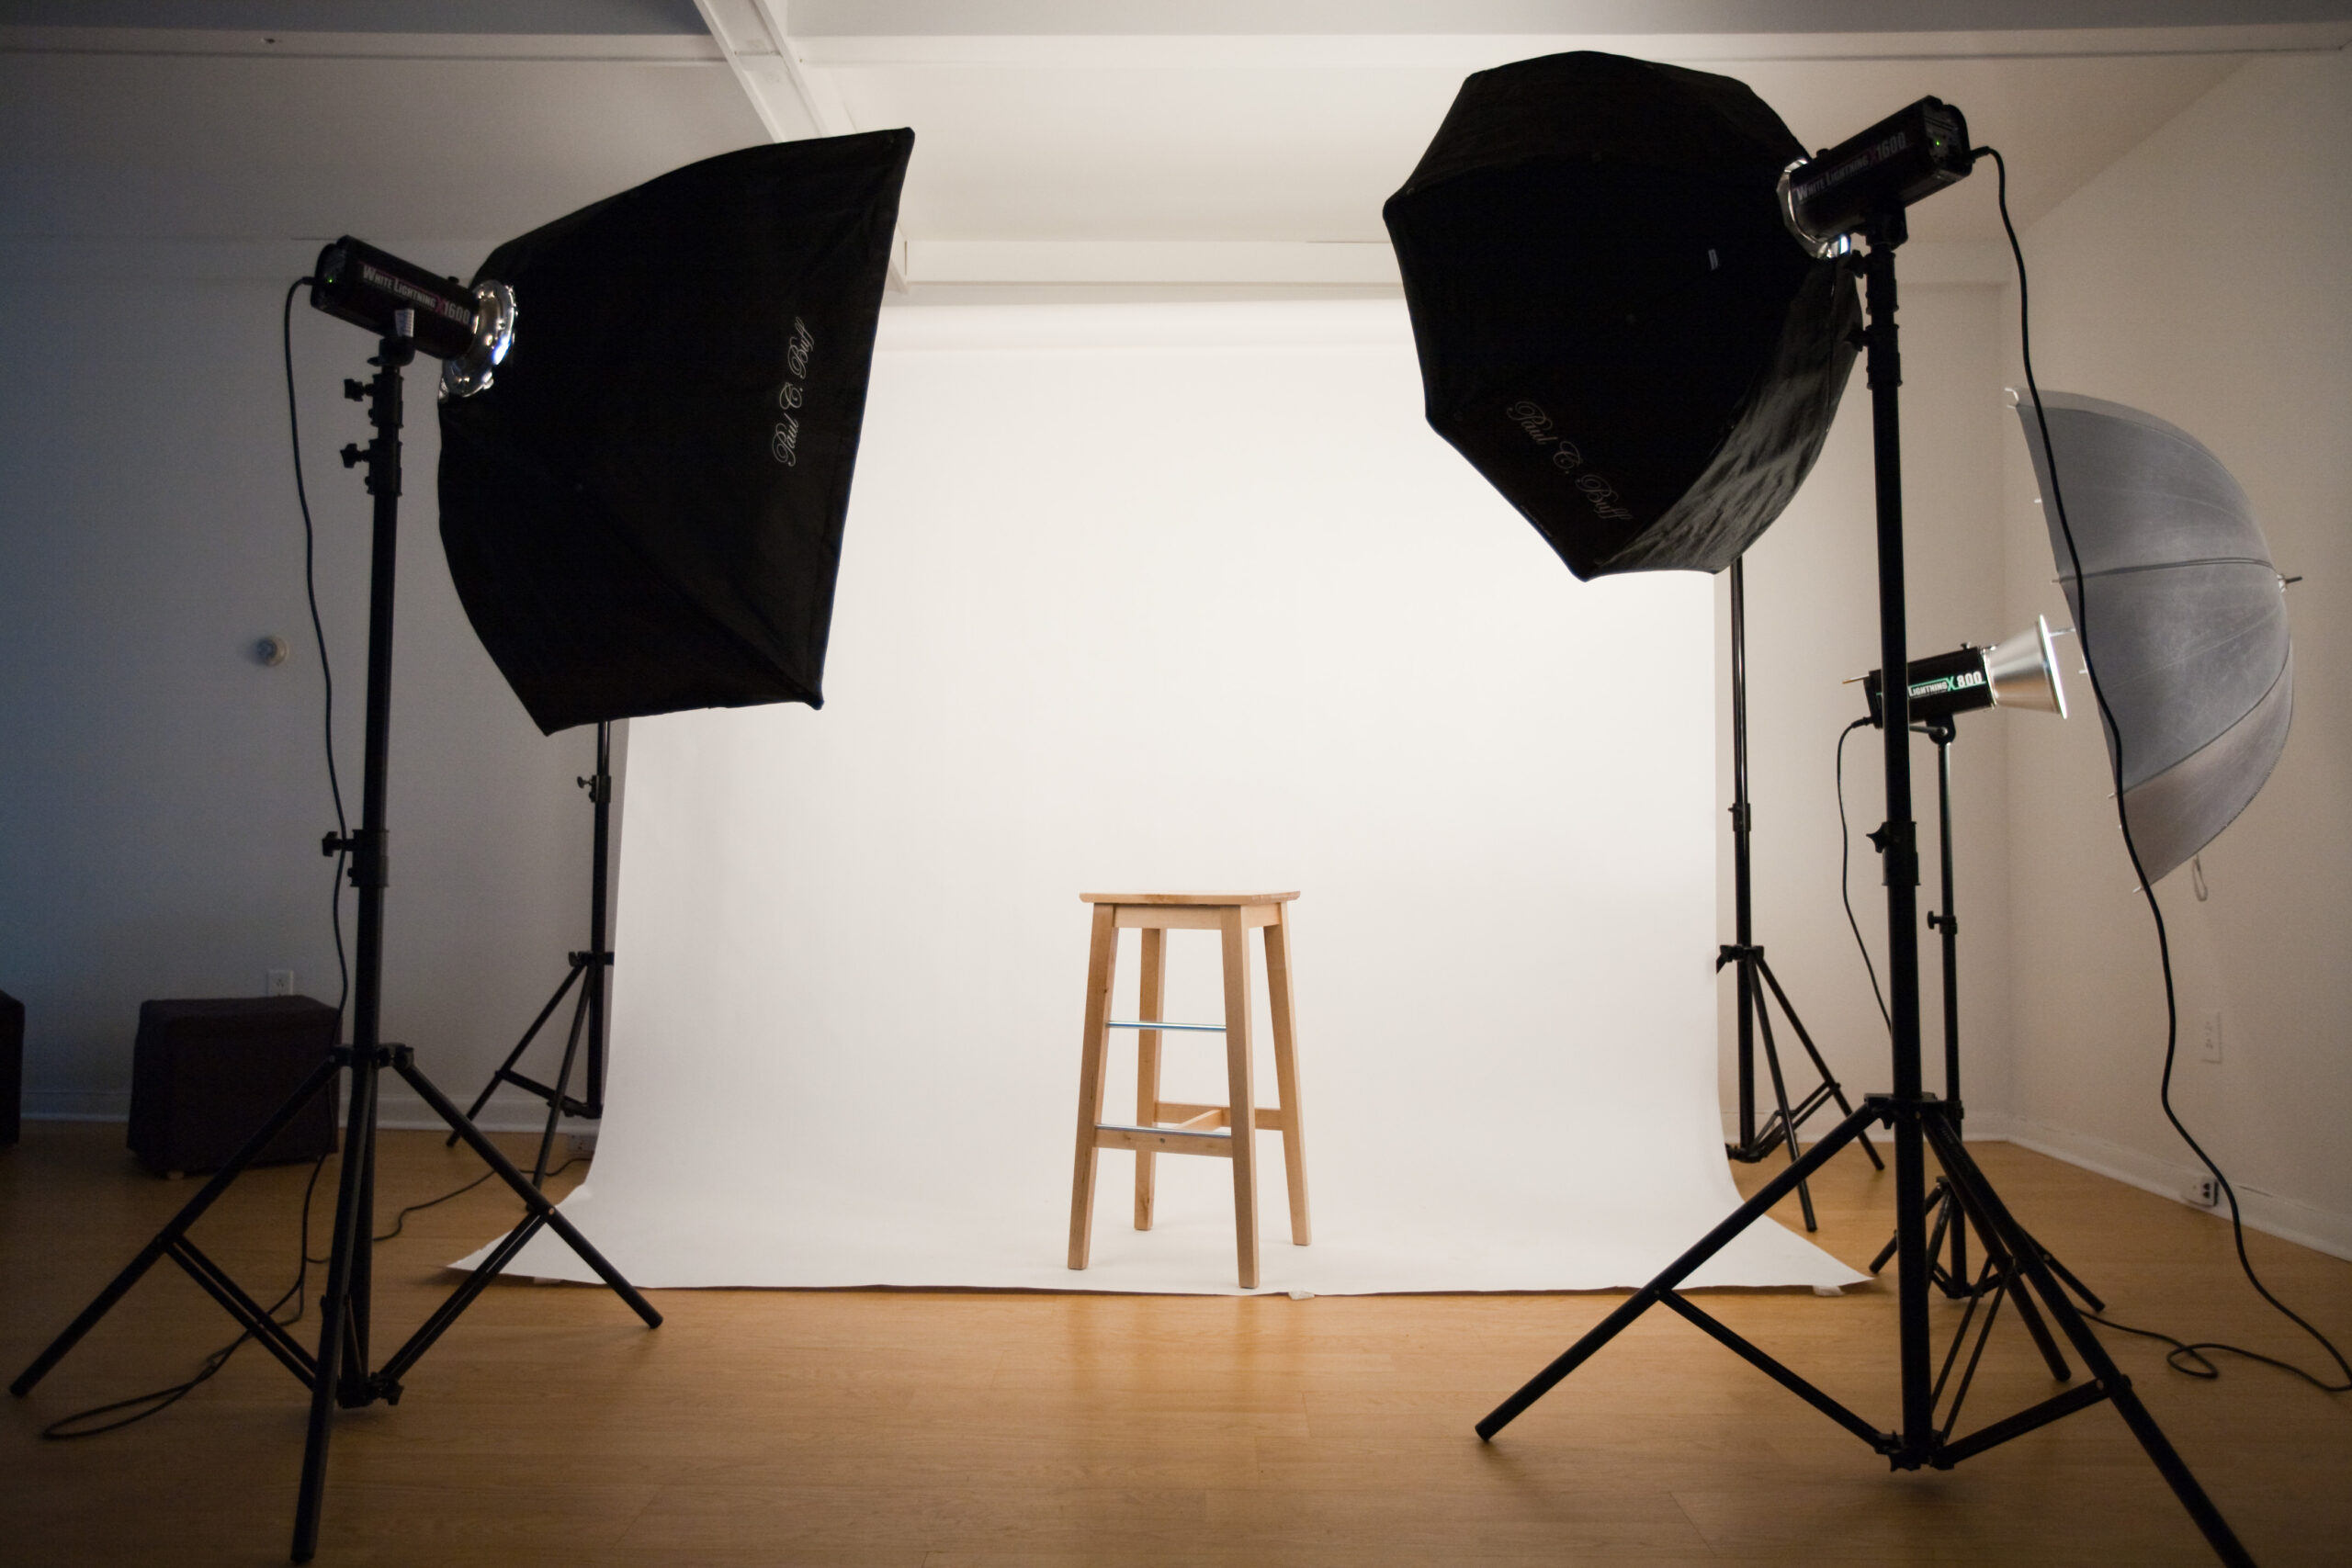 Aakay-photo-studio